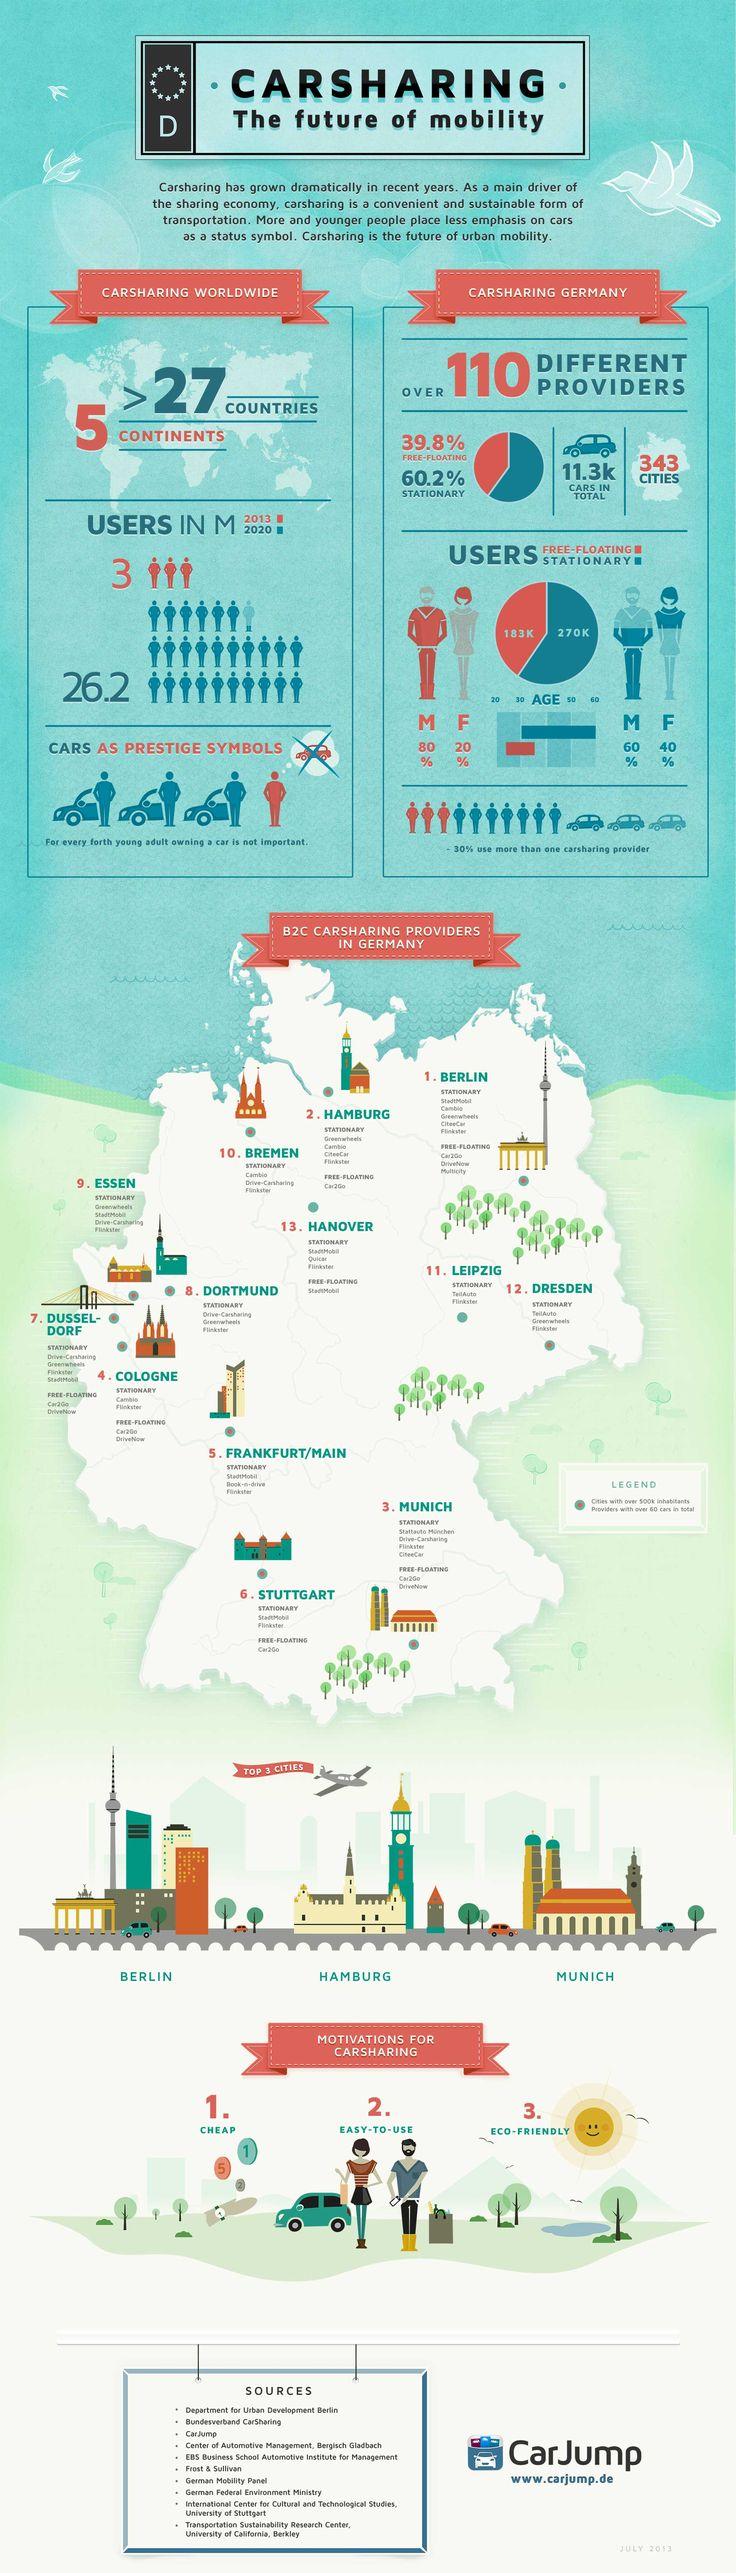 Carsharing-Infografik: Autos verschwinden als Status-Symbol #carsharing #infographic